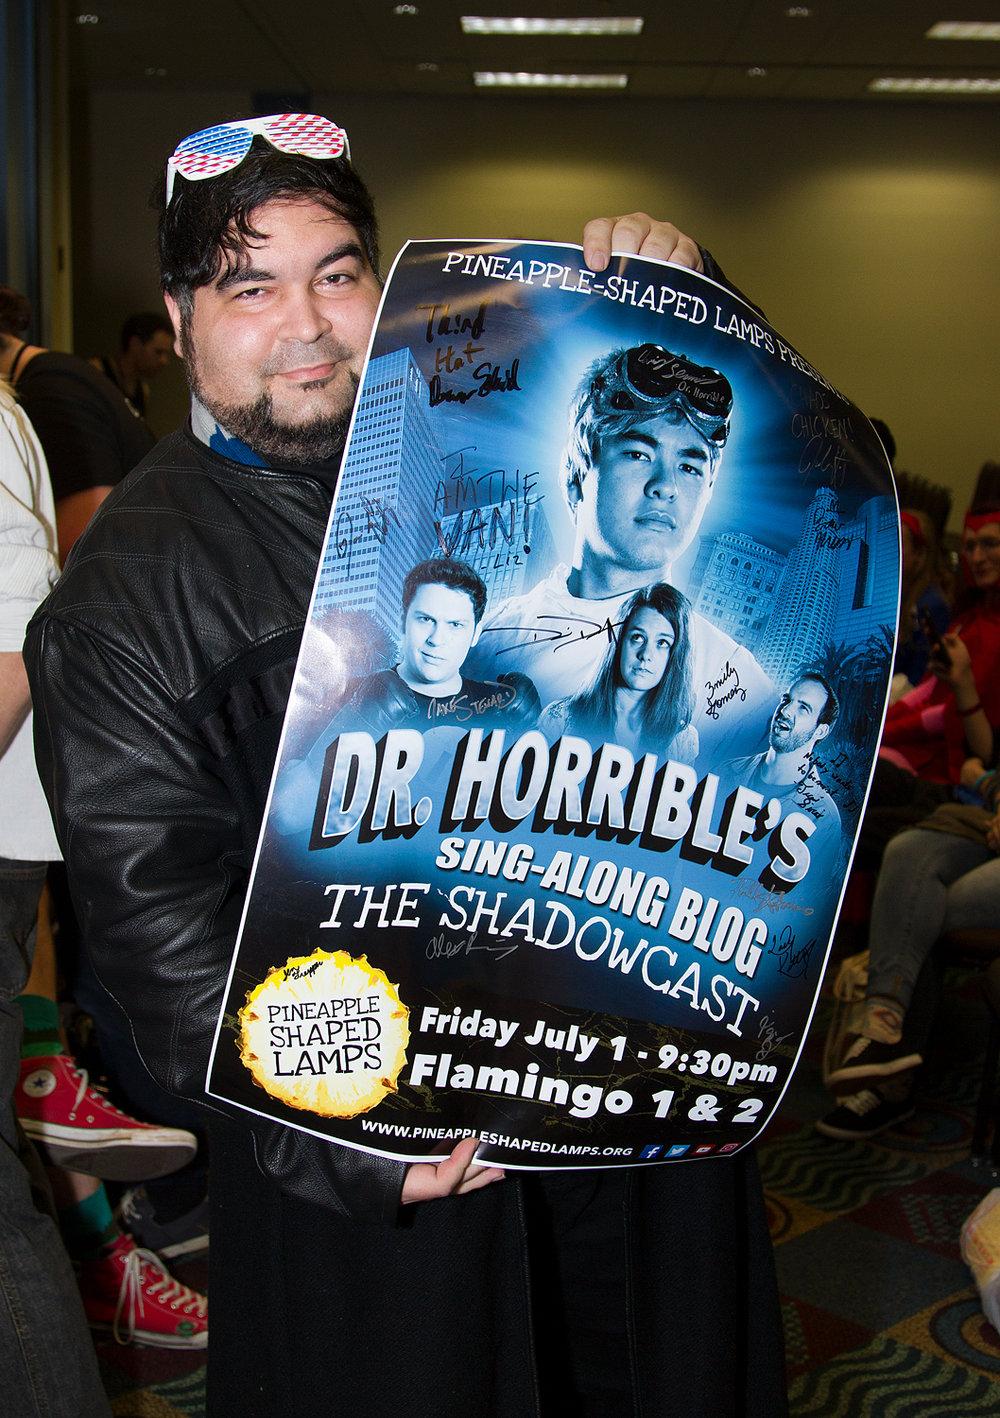 Dr. Horrible's Sing-Along Shadowcast